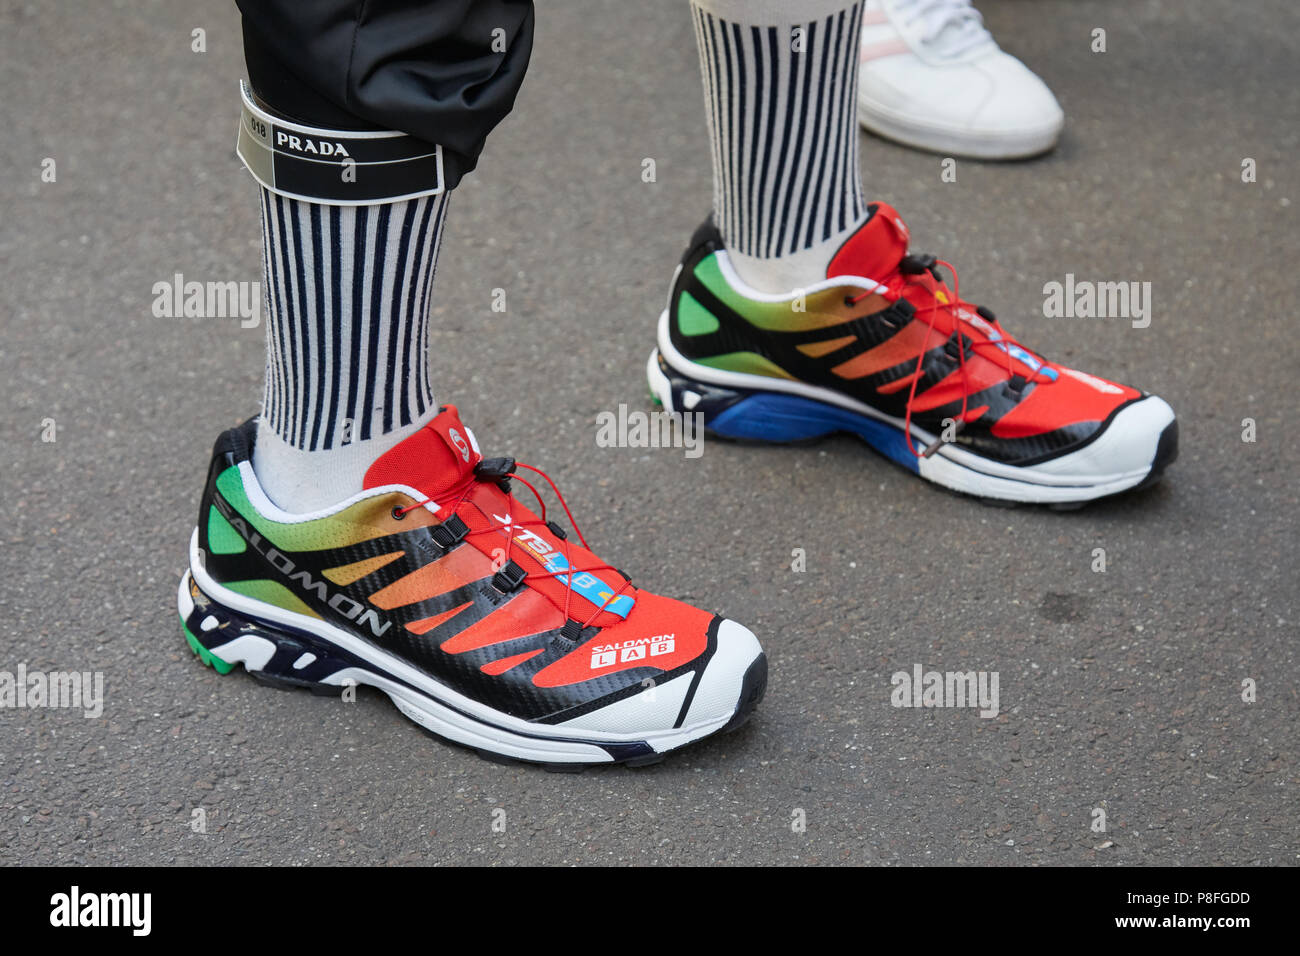 Salomon Shoes High Resolution Stock